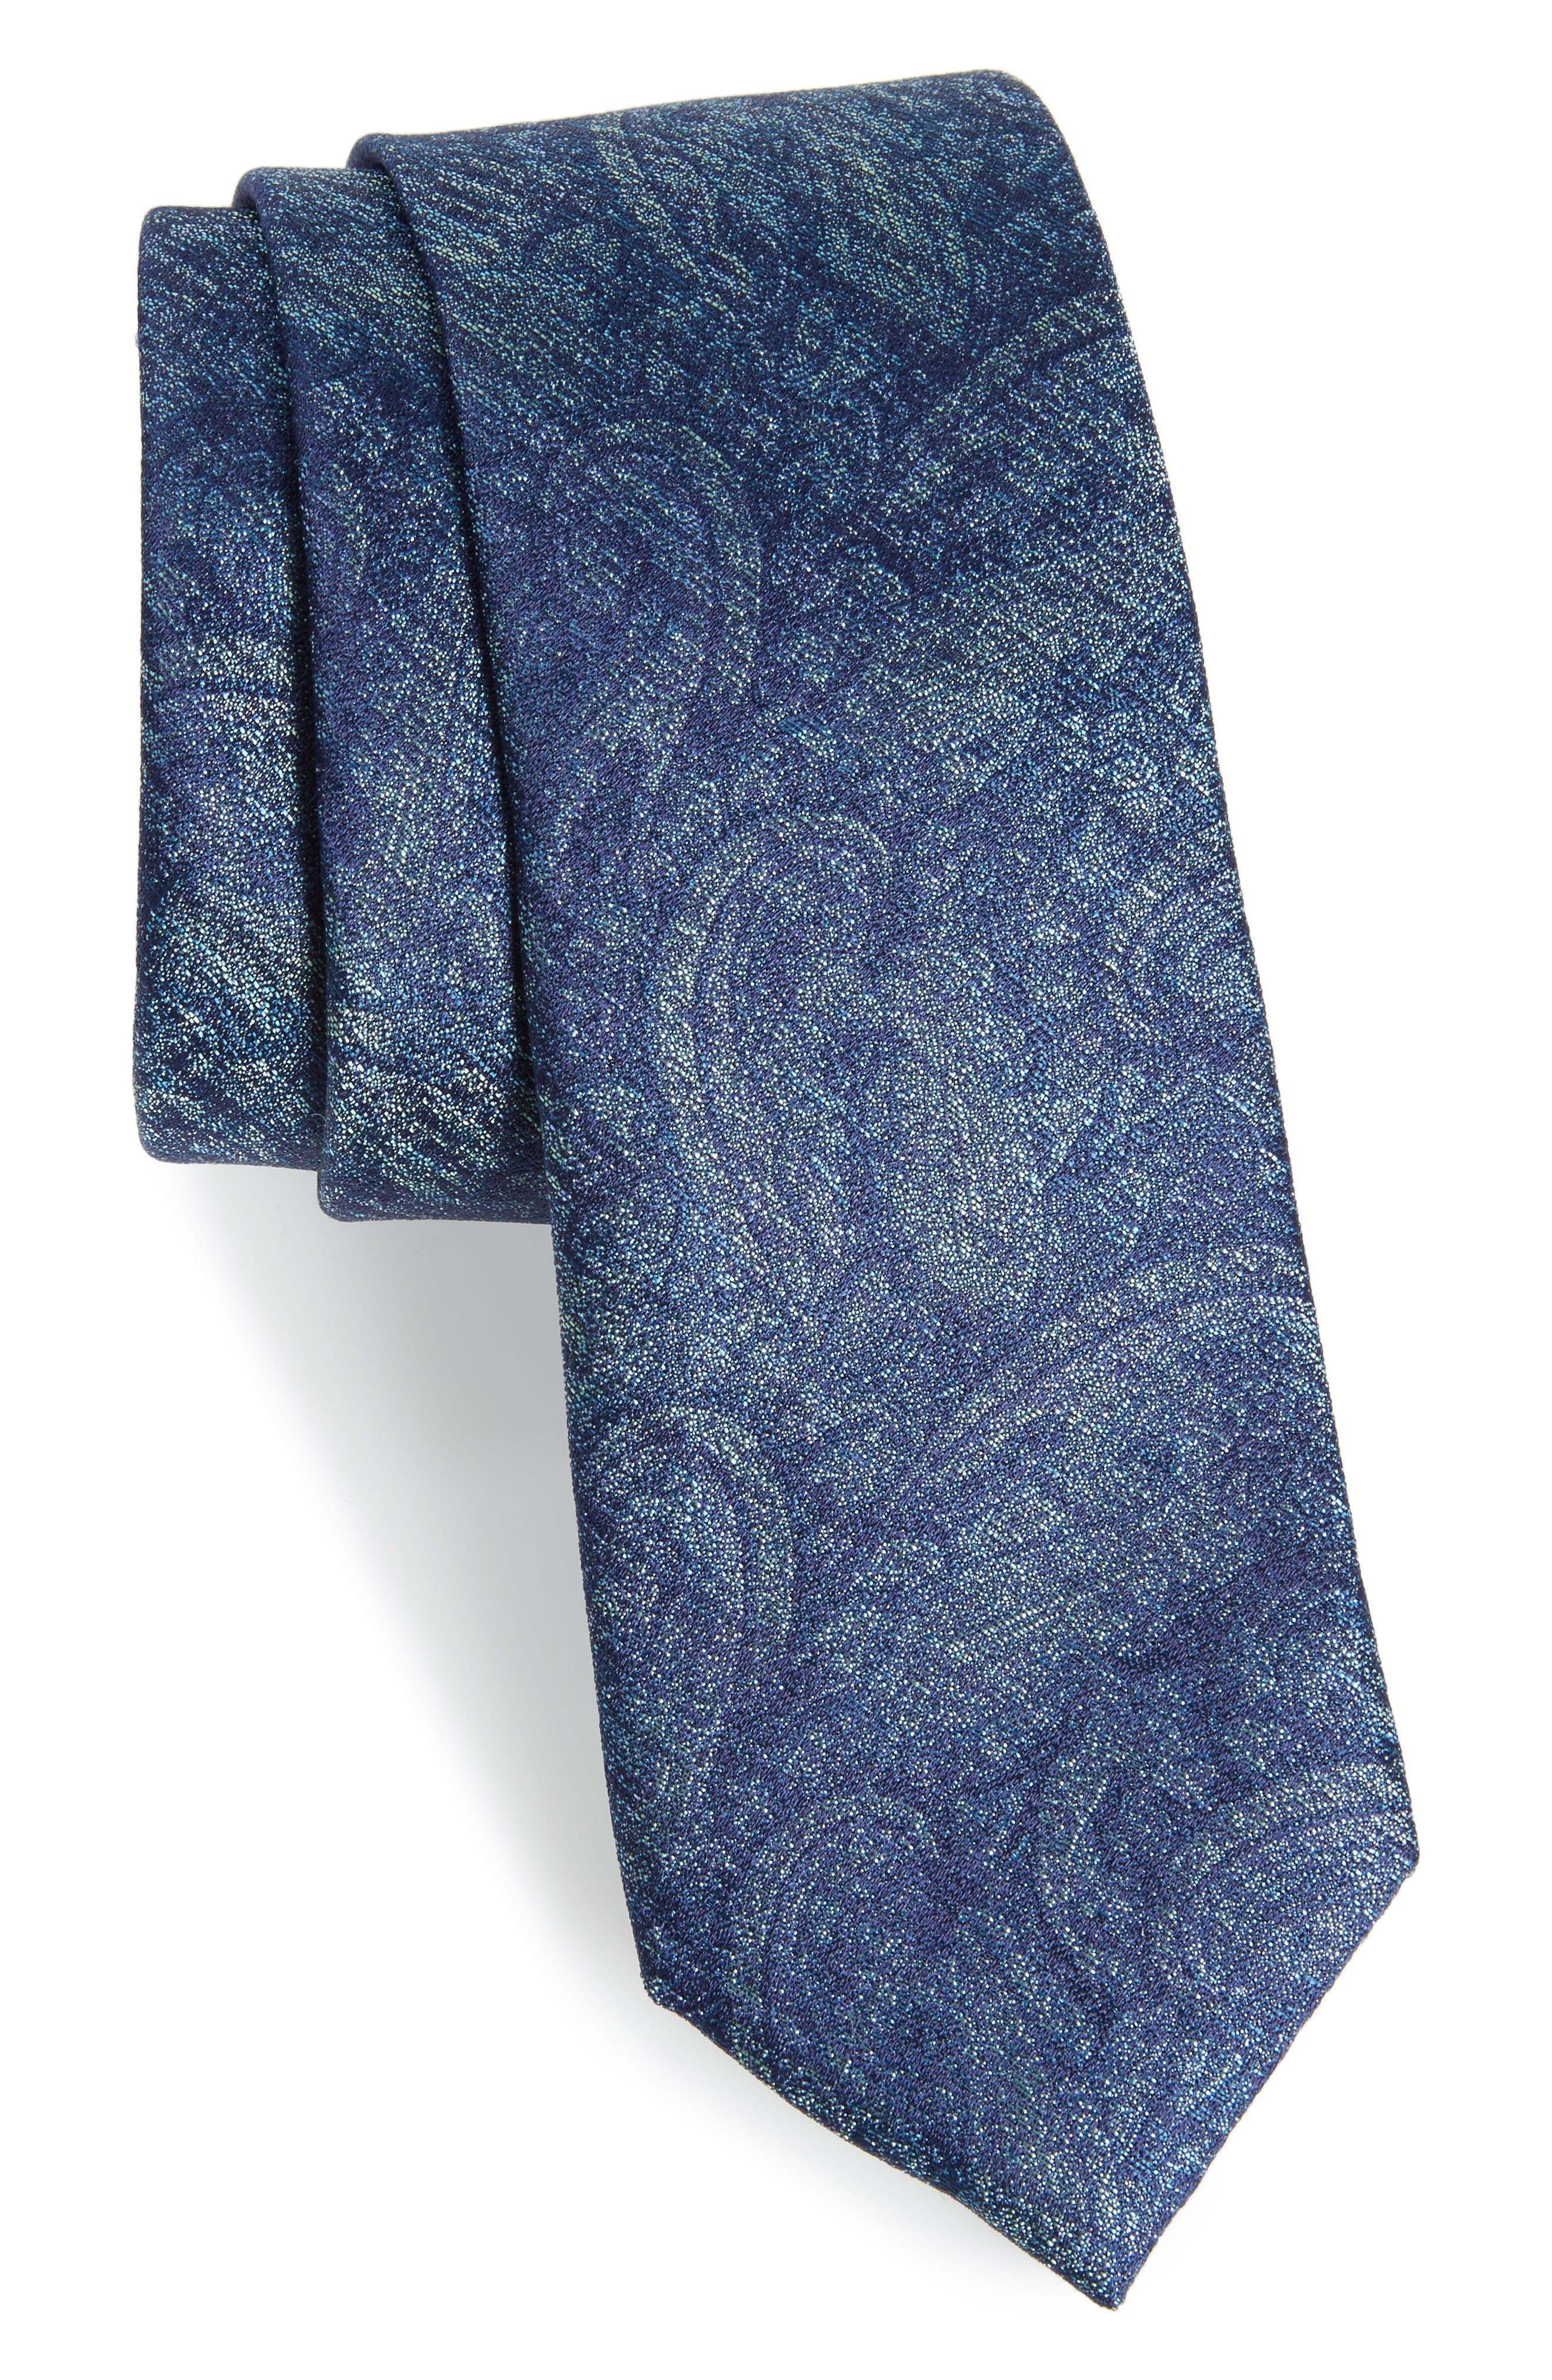 Alternate Image 1 Selected - Calibrate Alexander Paisley Silk Tie